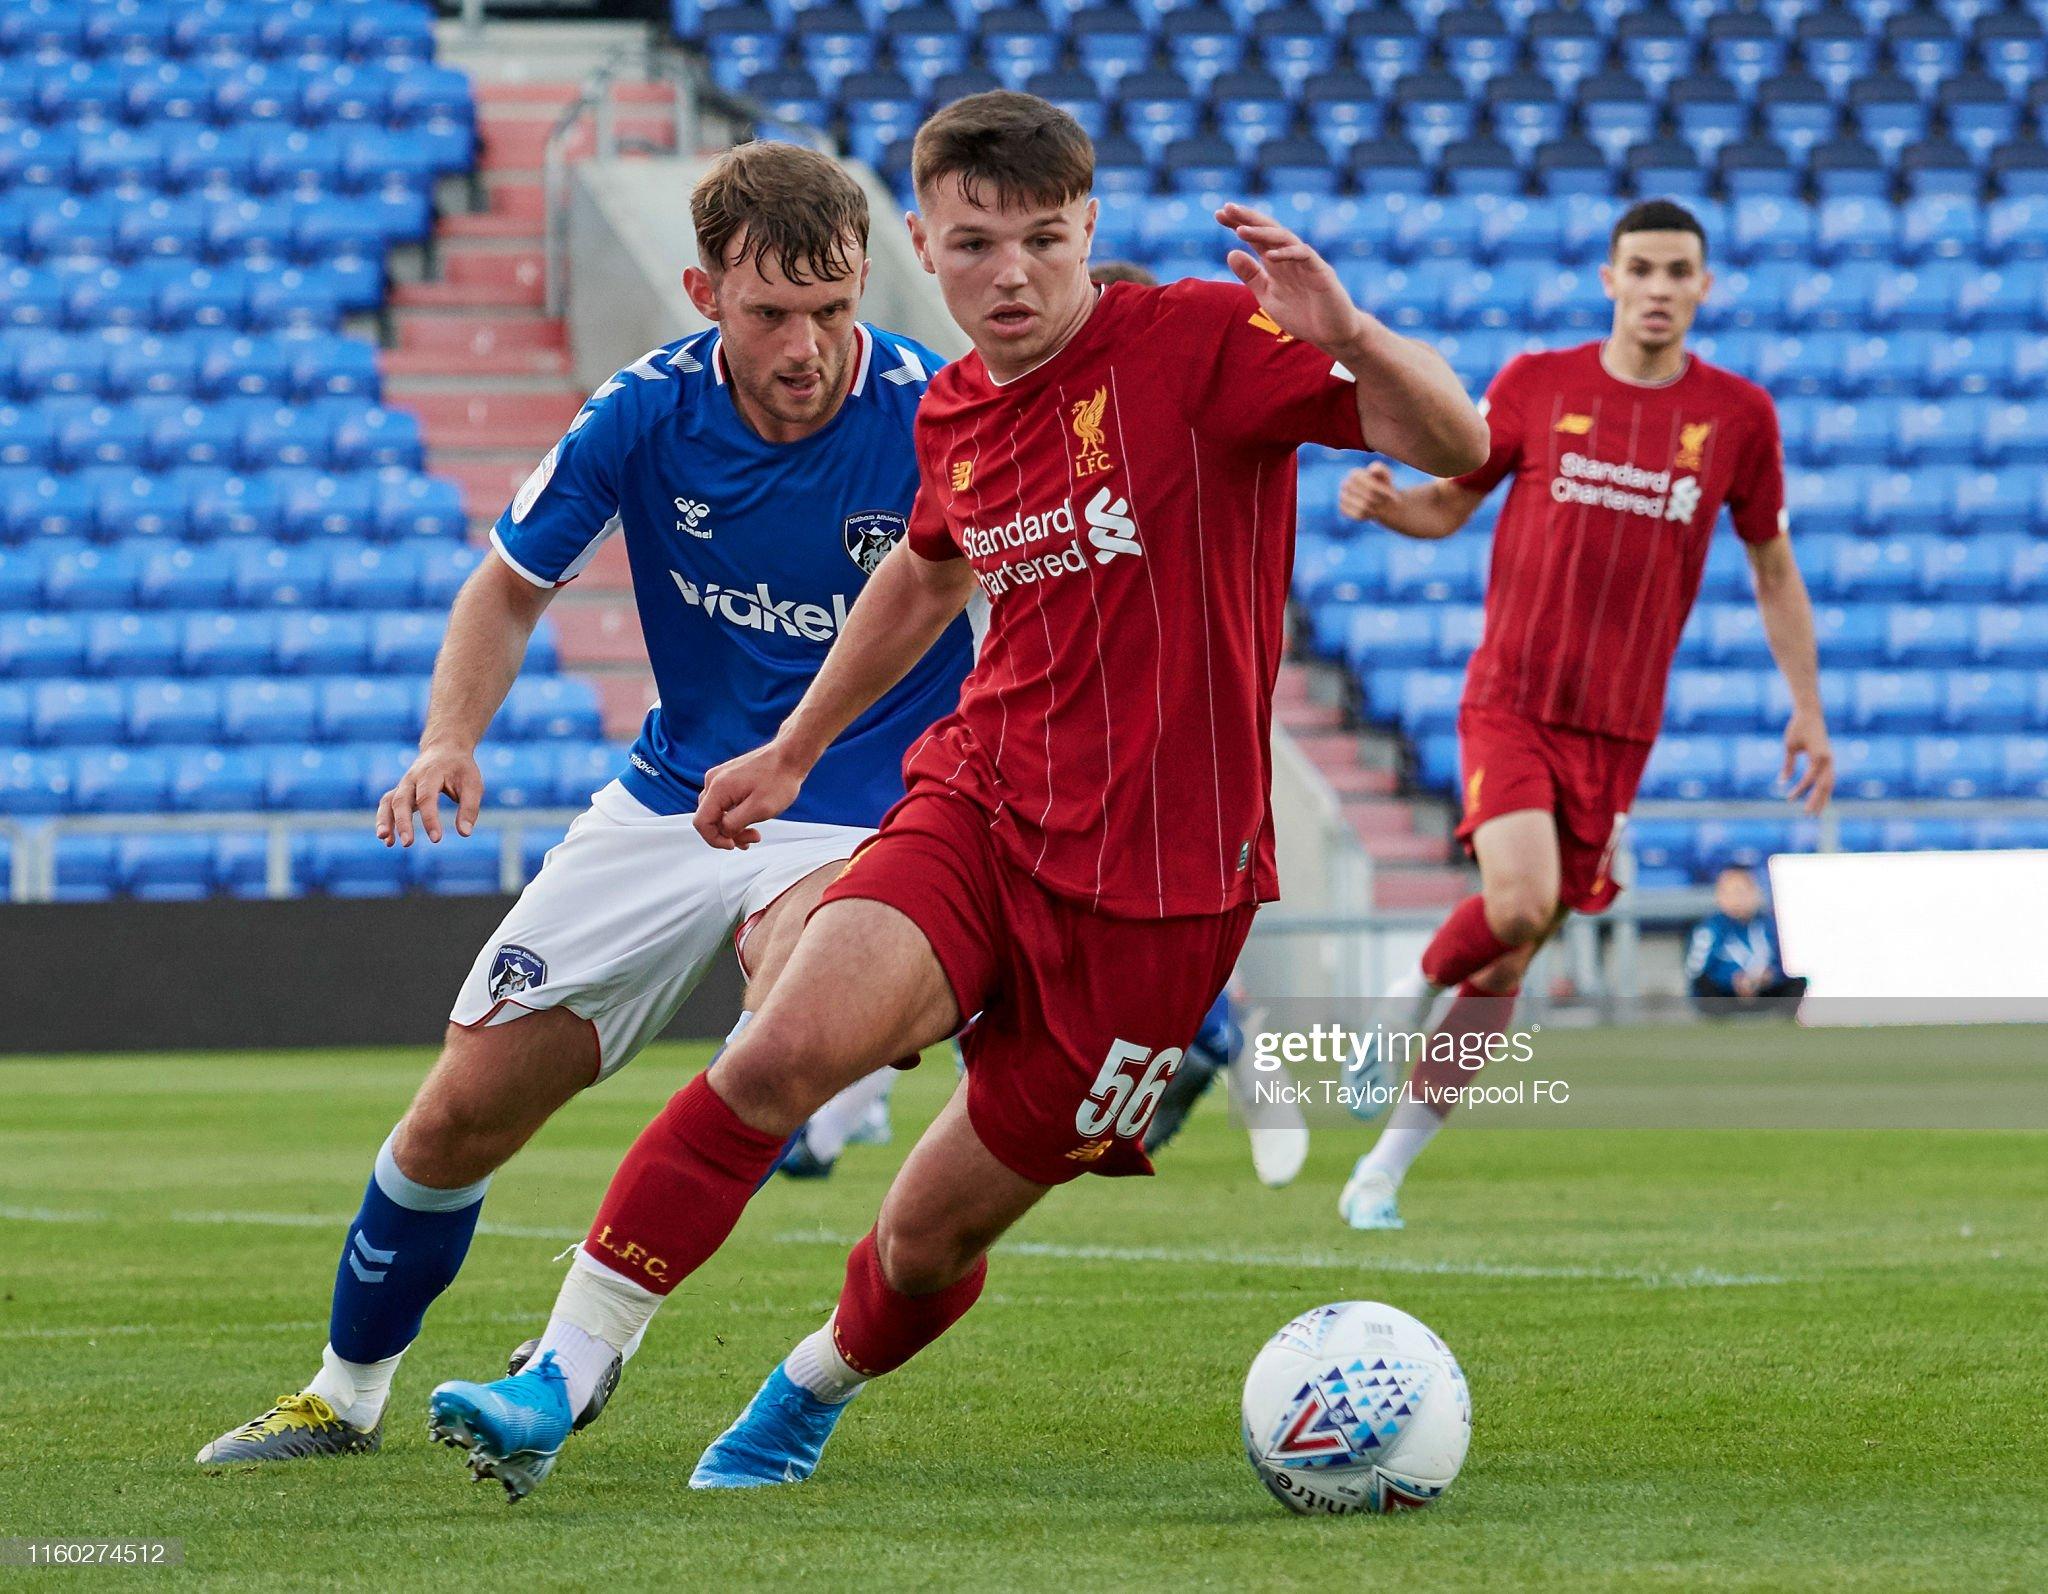 Oldham Athletic v Liverpool U21: Checkatrade Trophy : News Photo